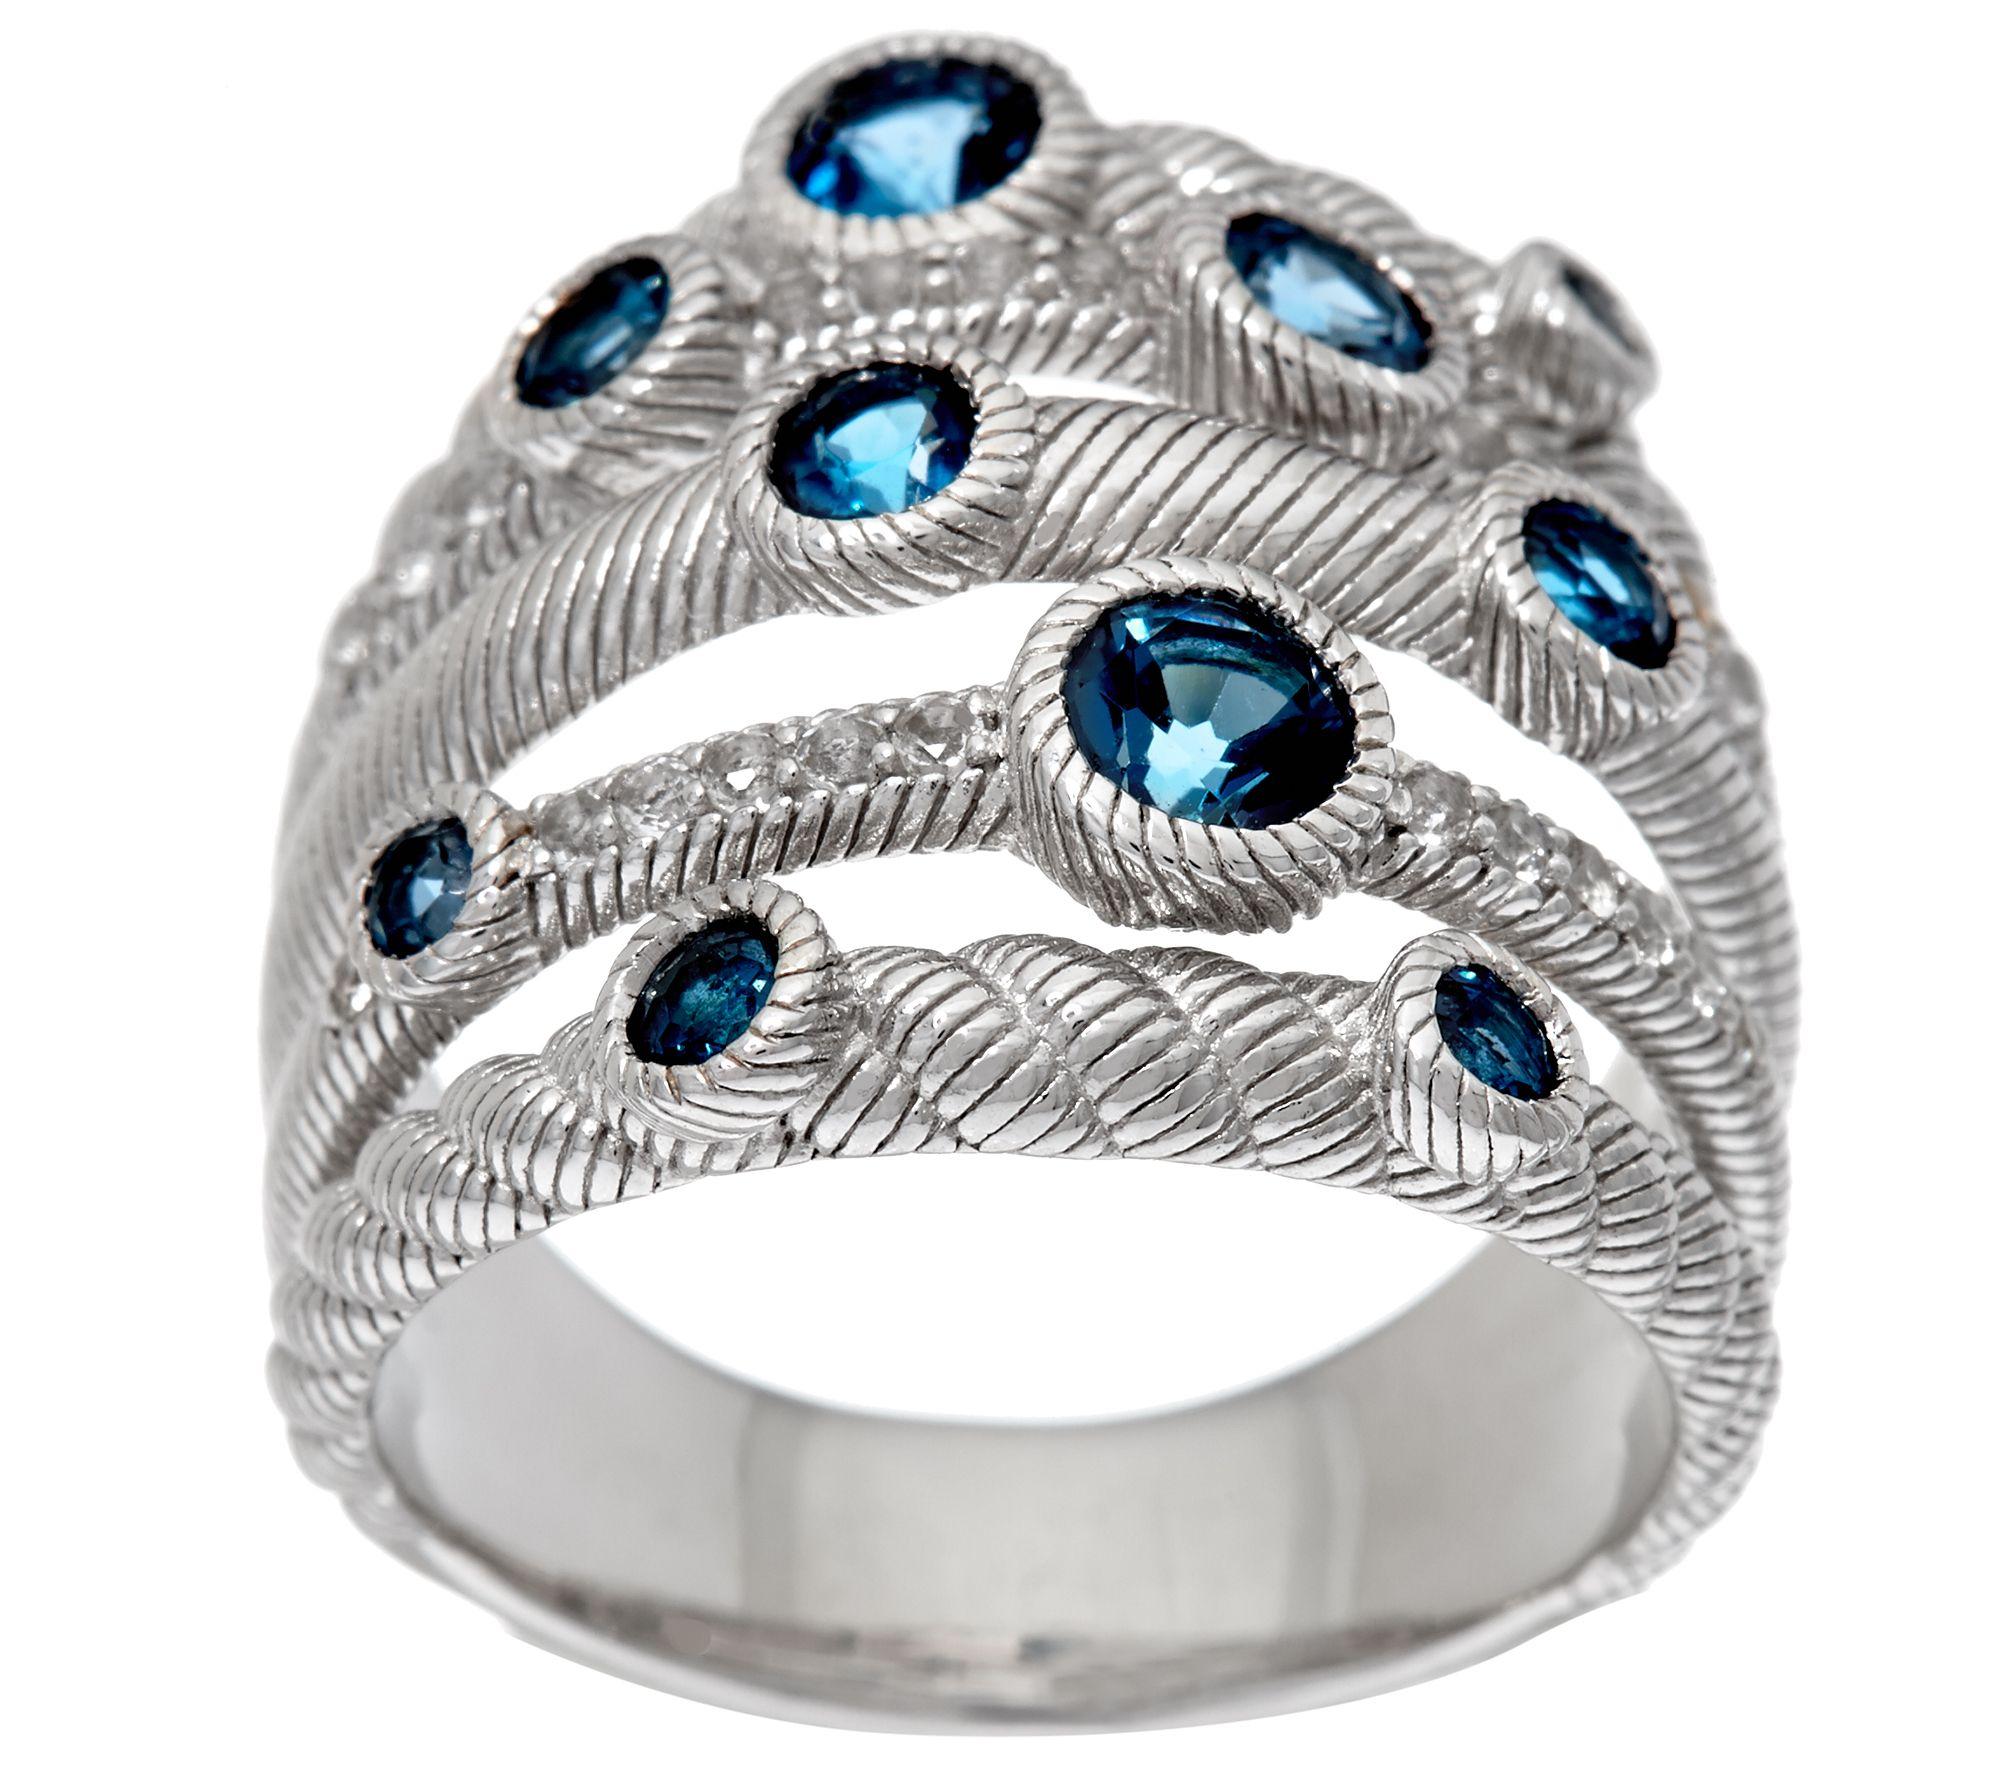 Judith Ripka Sterling Silver Multi Row 1 00 cttw Gemstone Ring